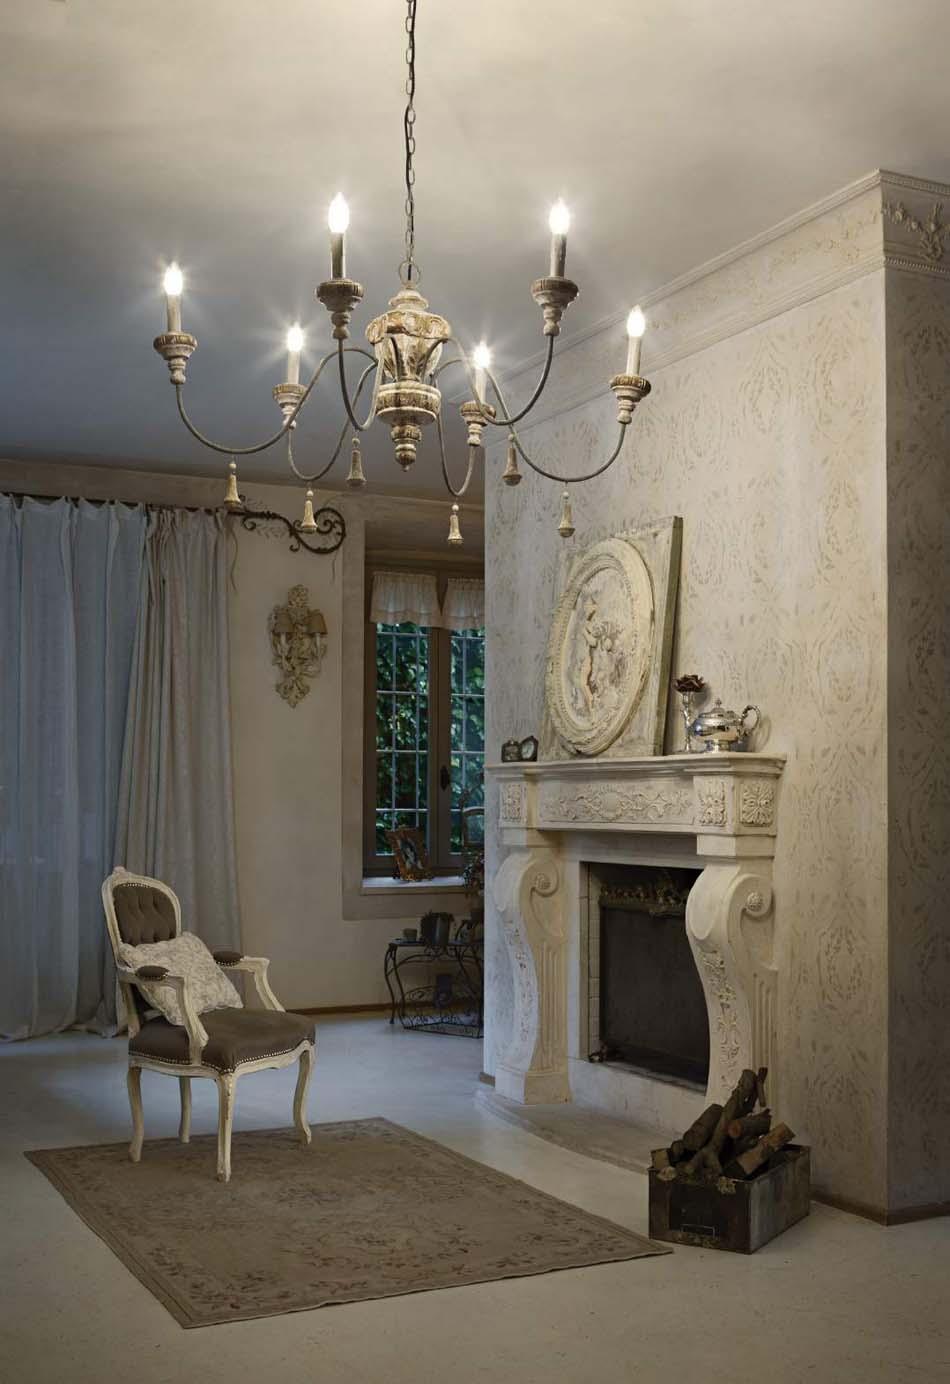 Lampade 20 sospese vintage Ideal Lux edith – Toscana Arredamenti